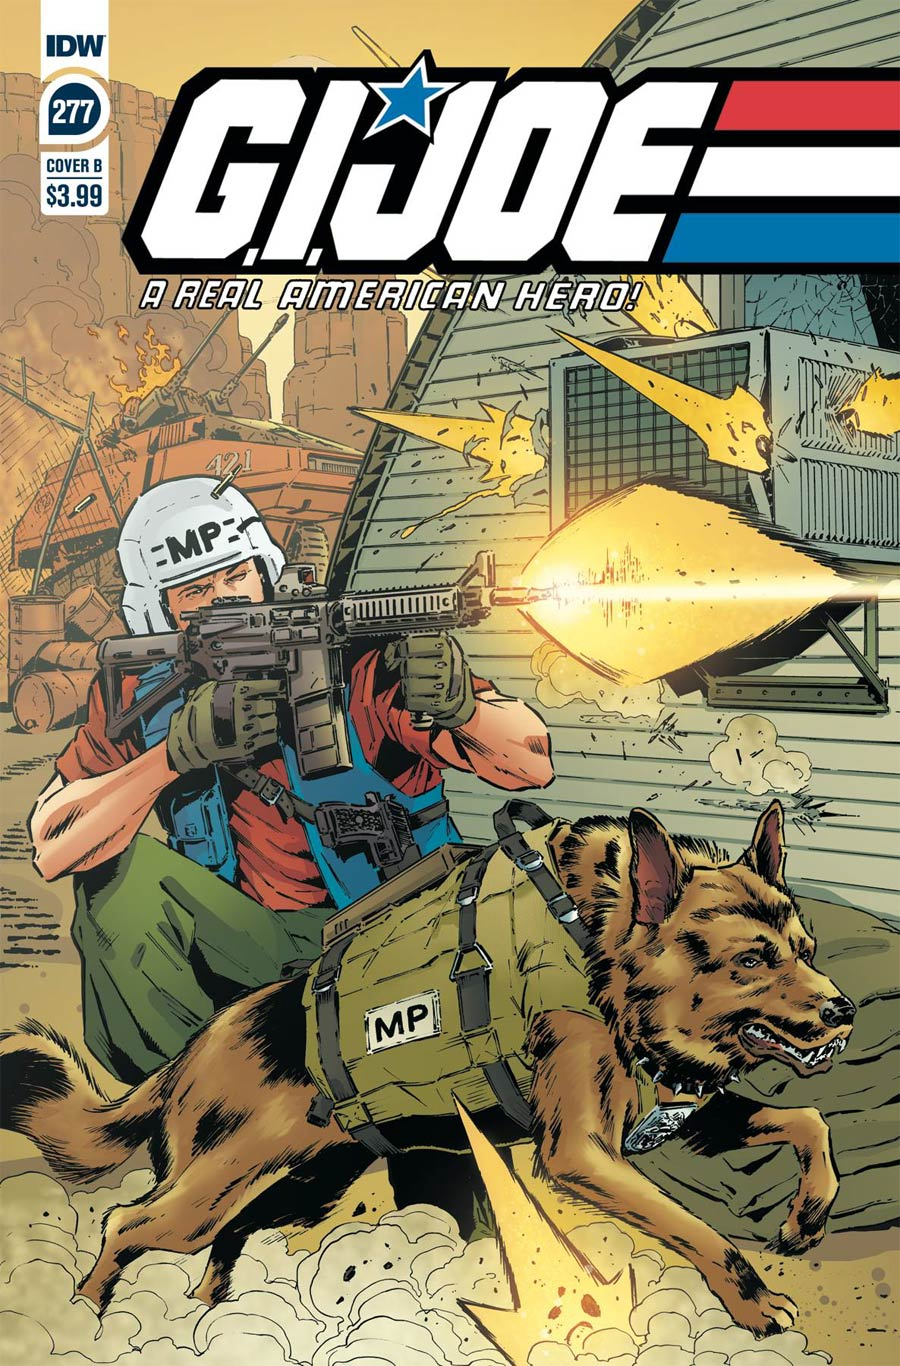 GI Joe A Real American Hero #277 Cover B Variant SL Gallant Cover